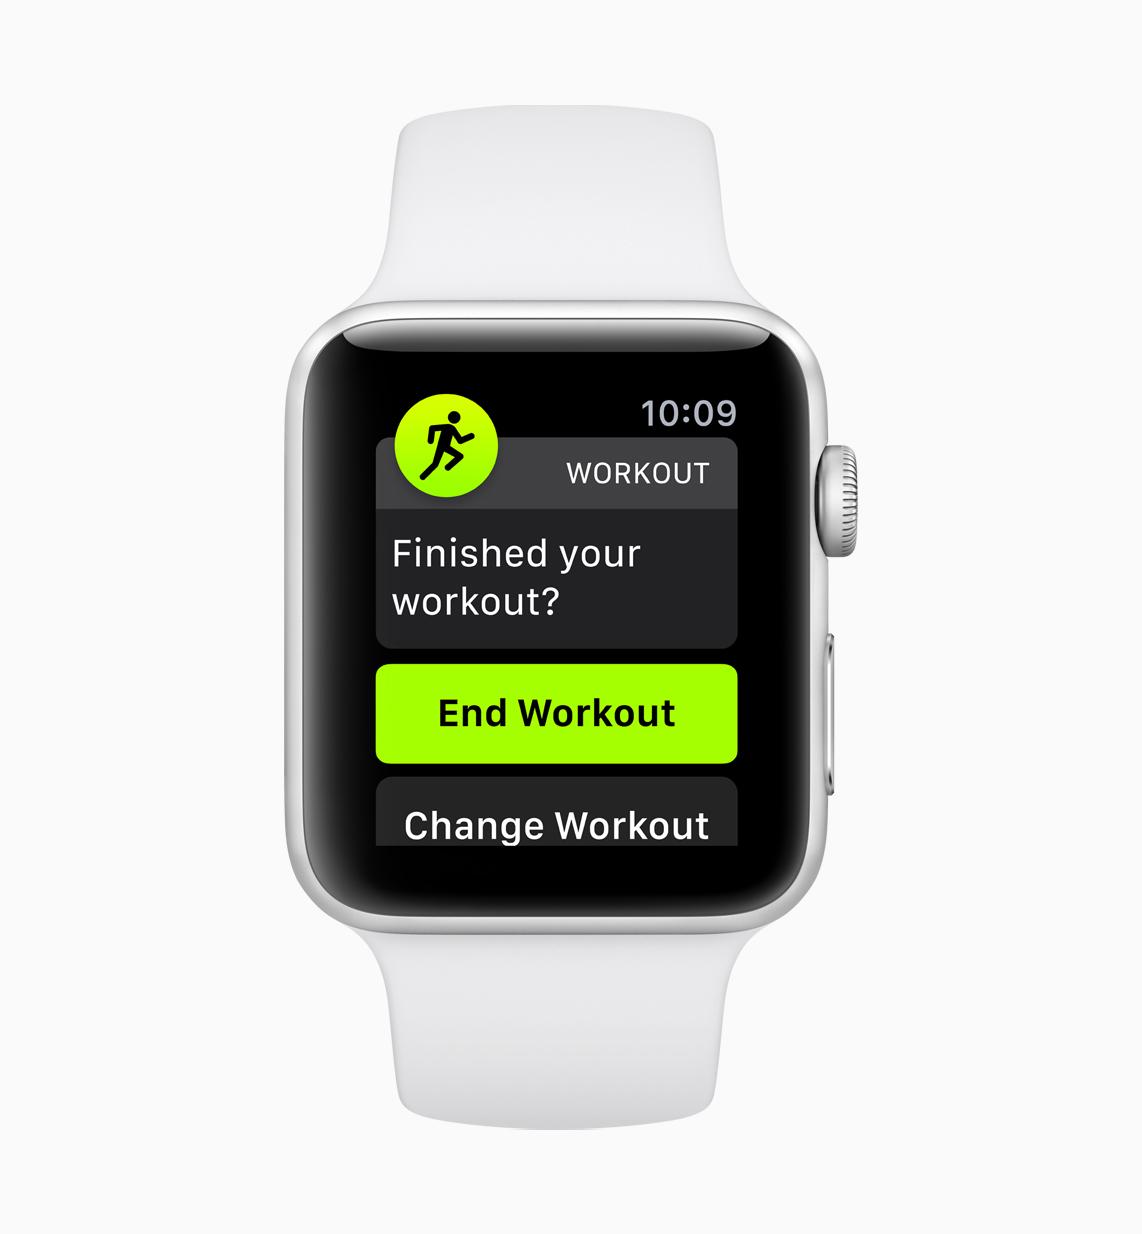 Apple-watchOS_5-Workout-Detections-02-screen-06042018.jpg